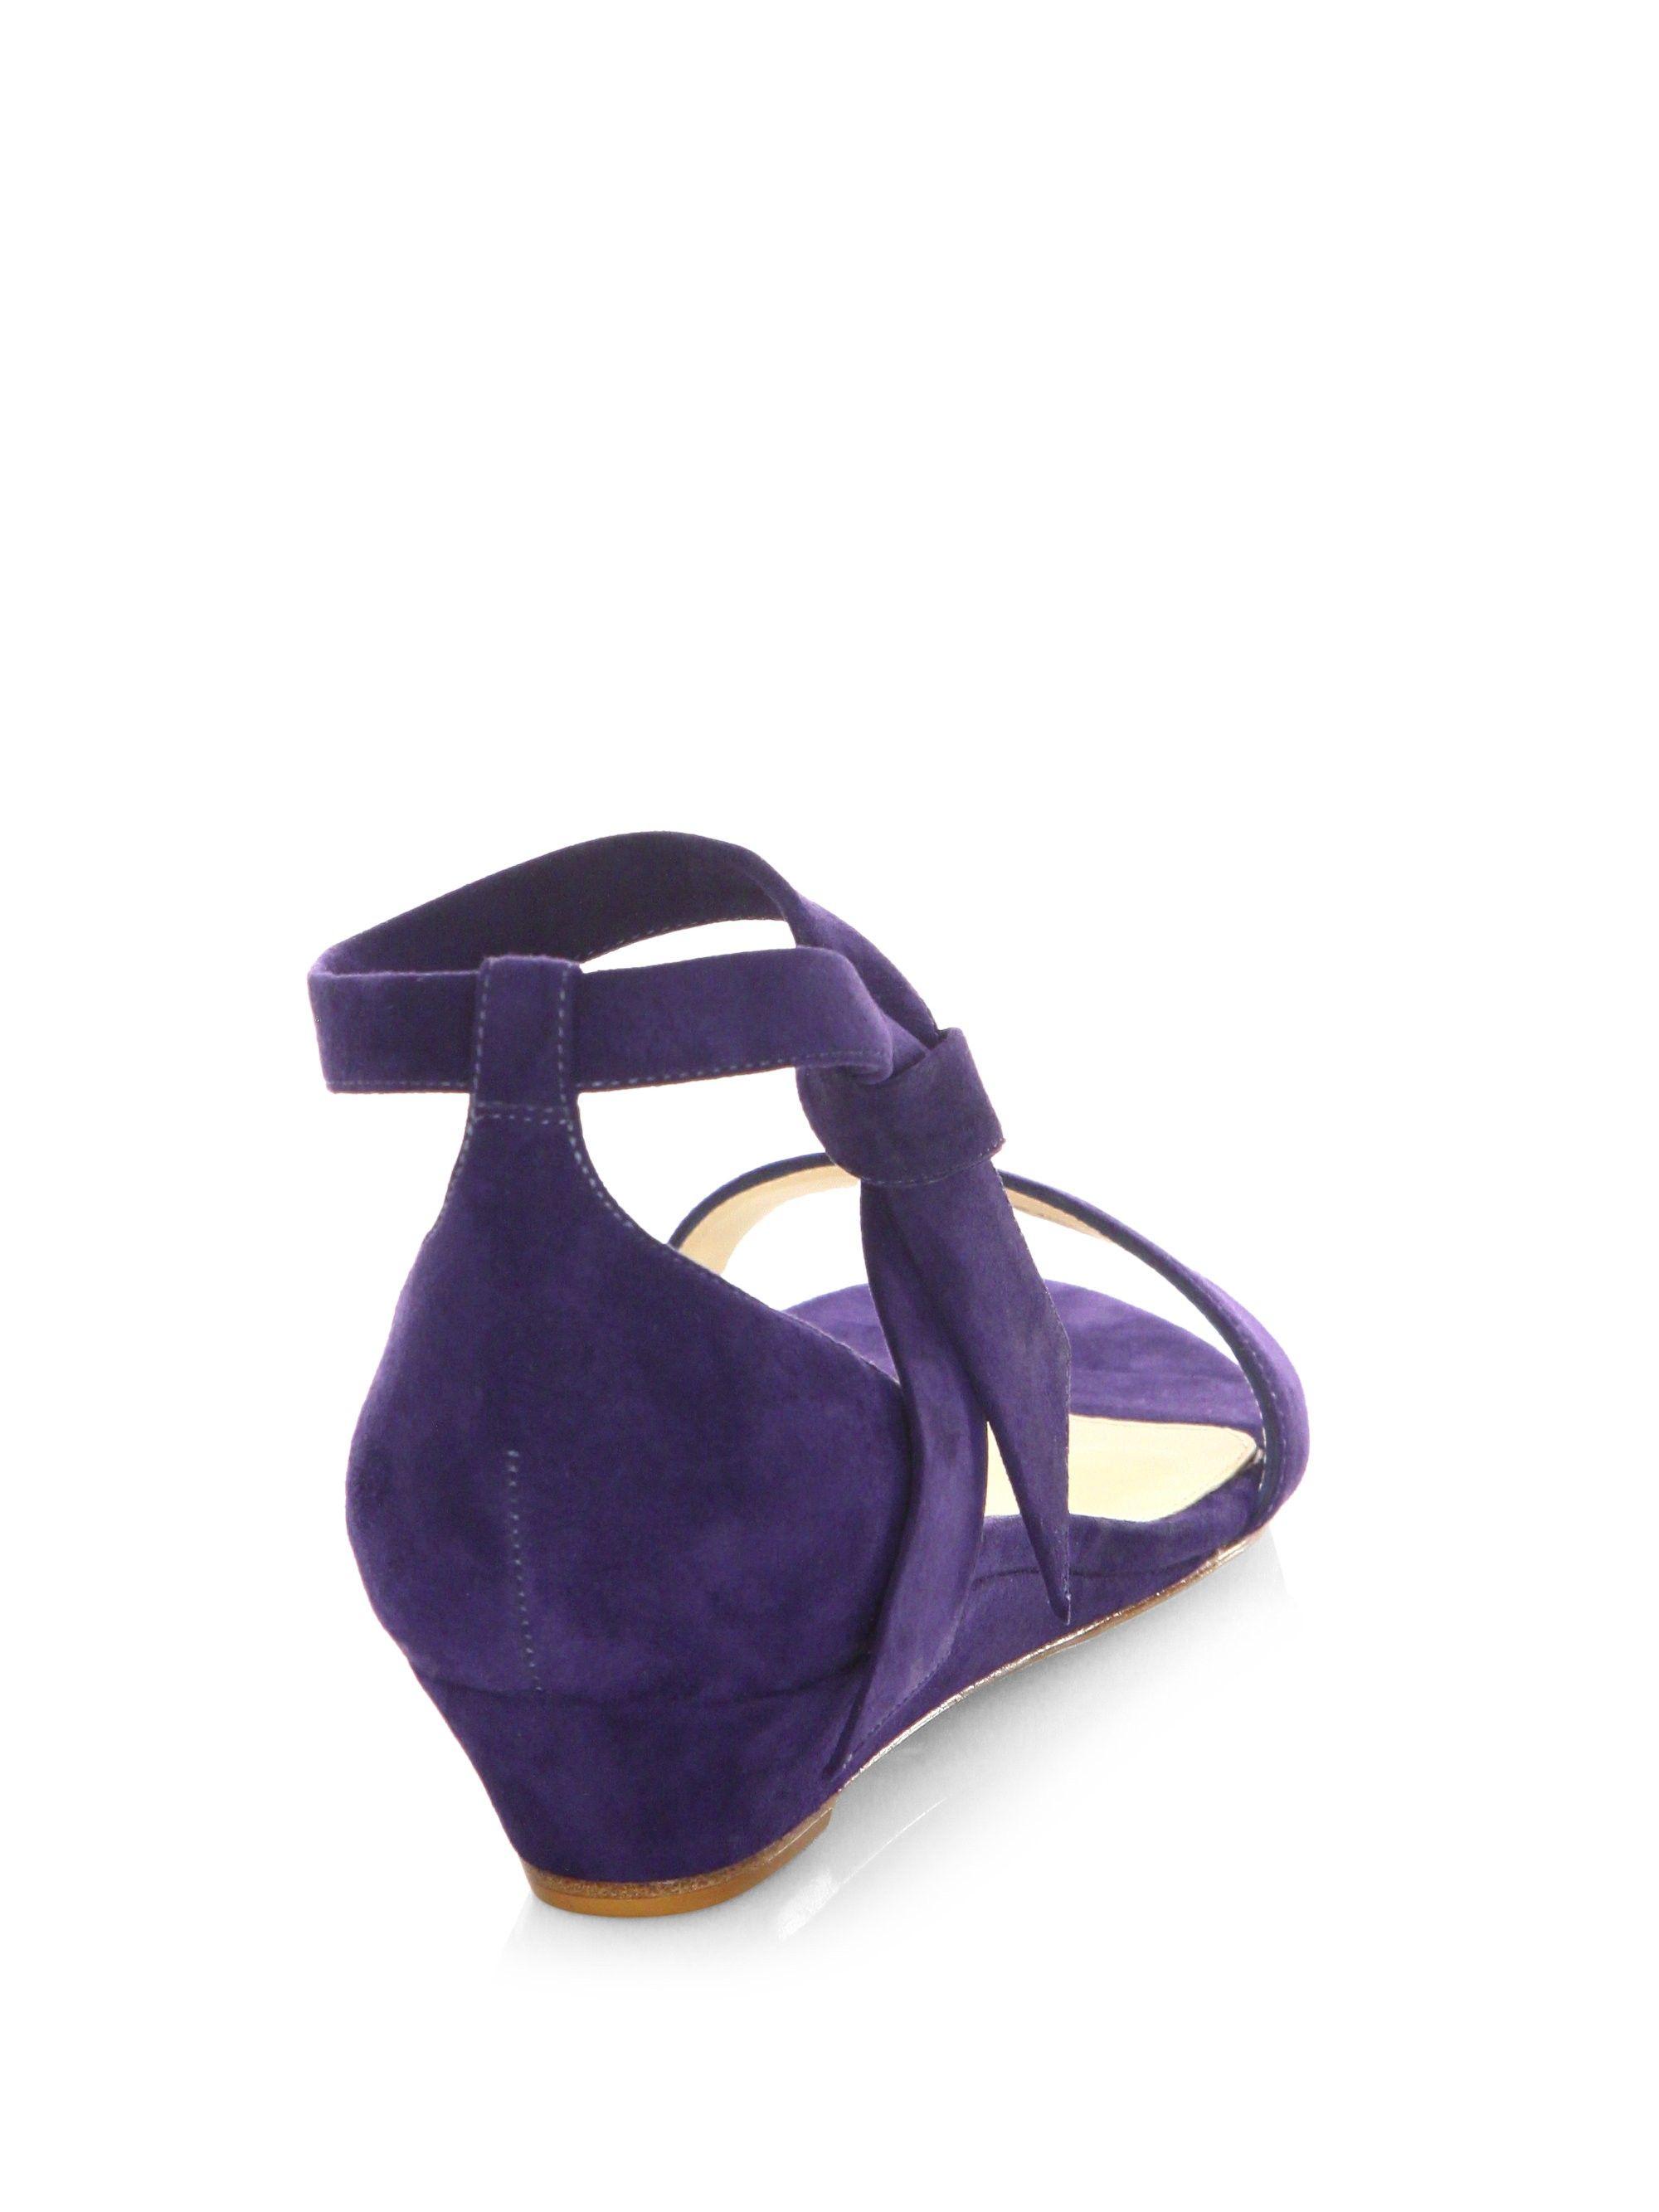 a67c0c3d1905 Alexandre Birman Clarita Suede Ankle-Tie Demi-Wedge Sandals - Nude 5.5